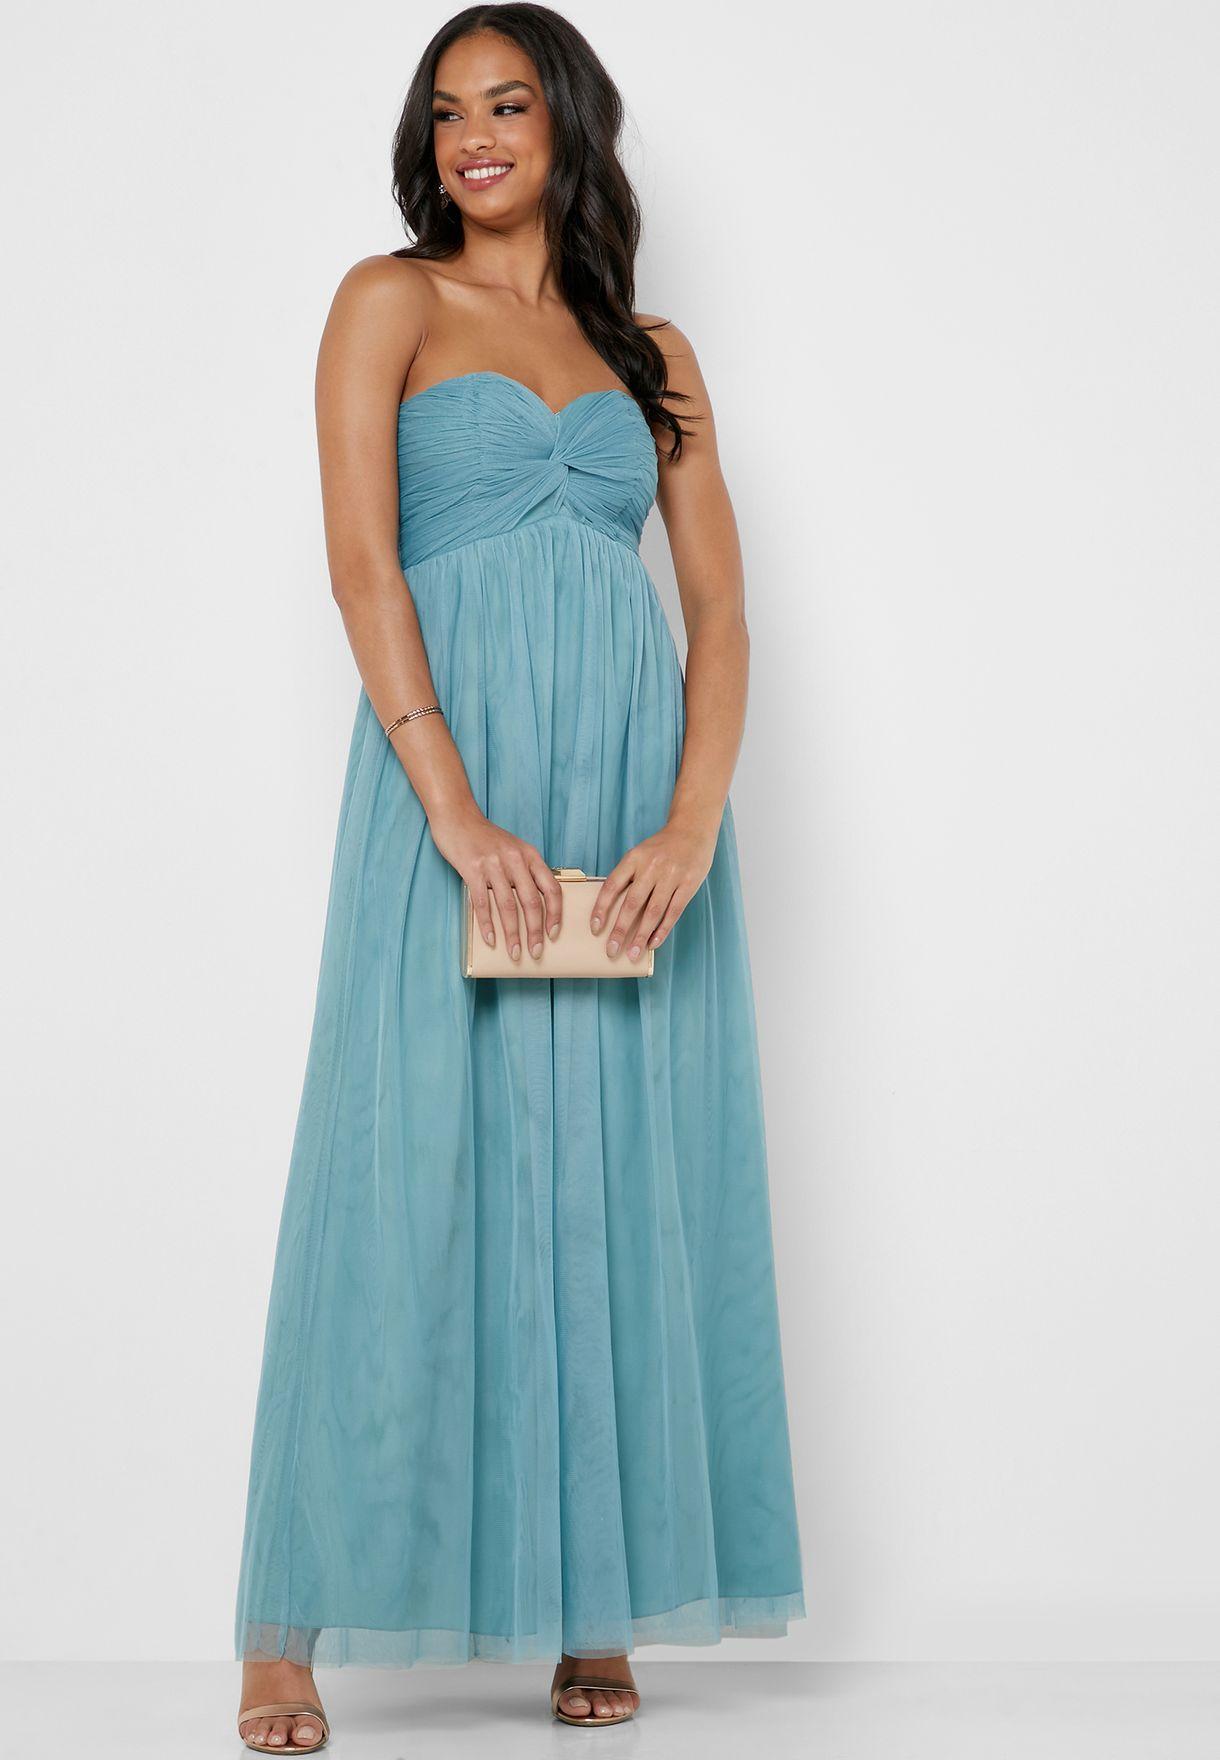 Tube Neck Lace Tulle Dress